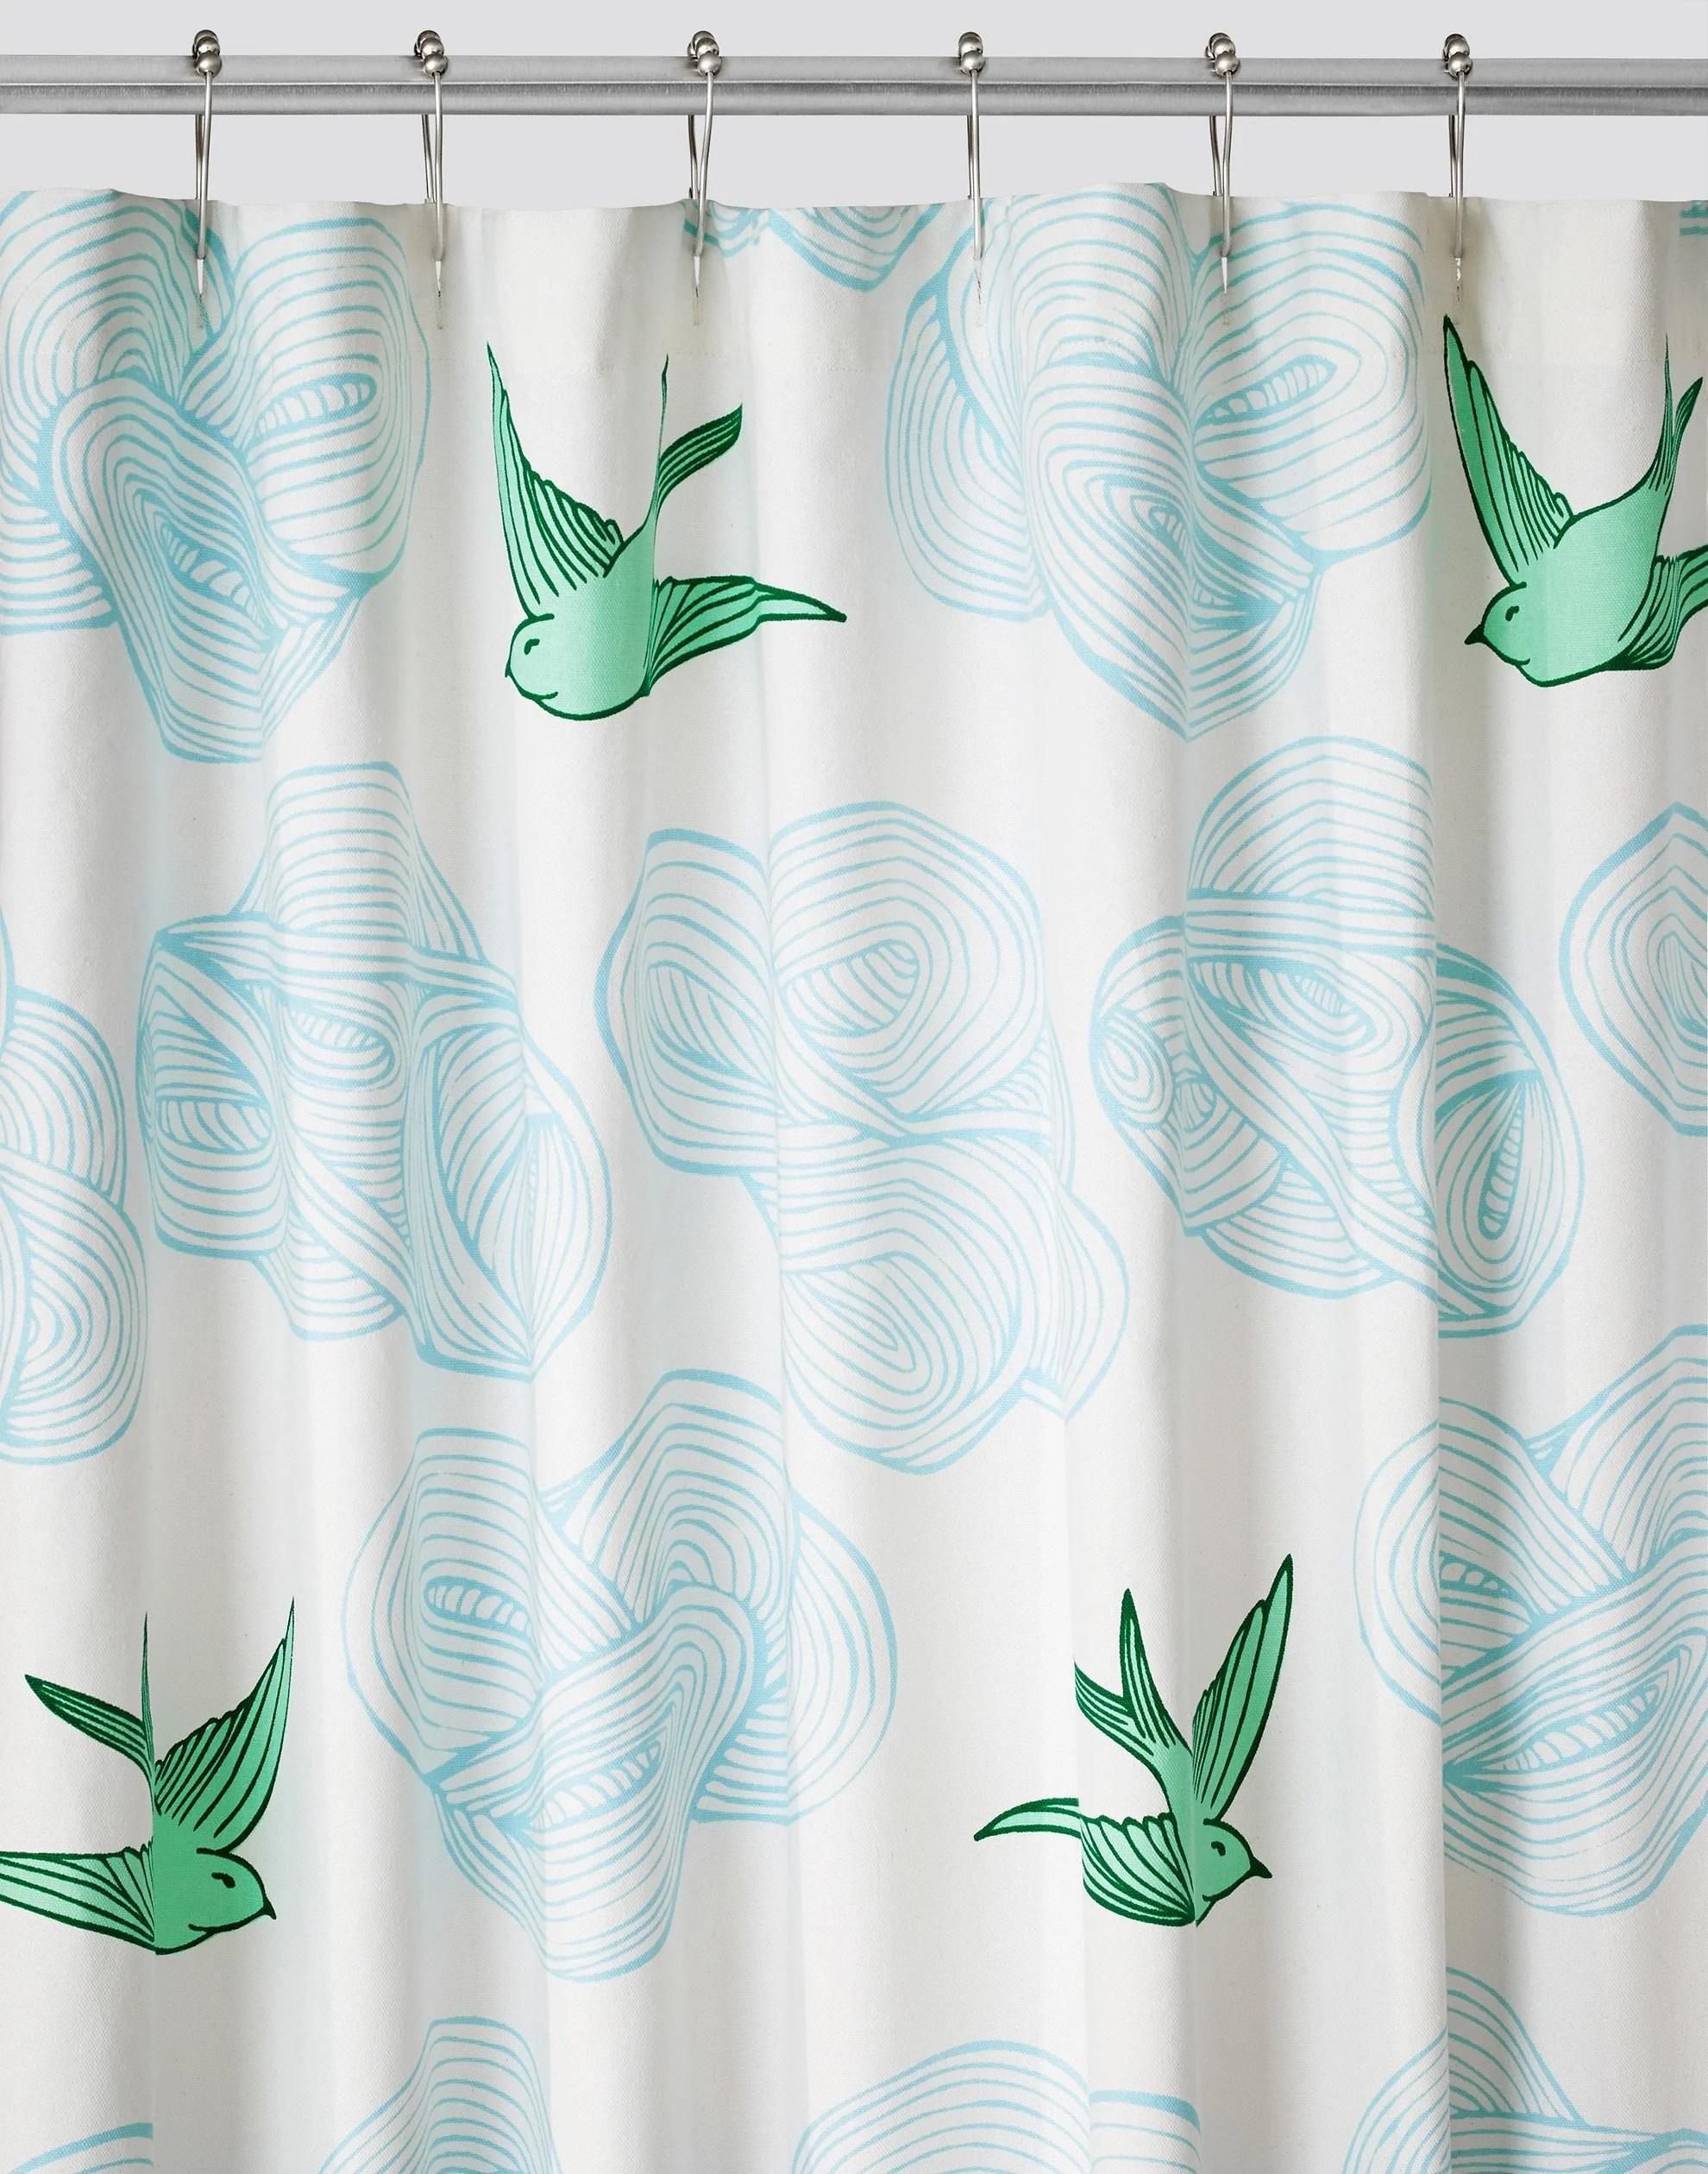 designer shower curtains colors